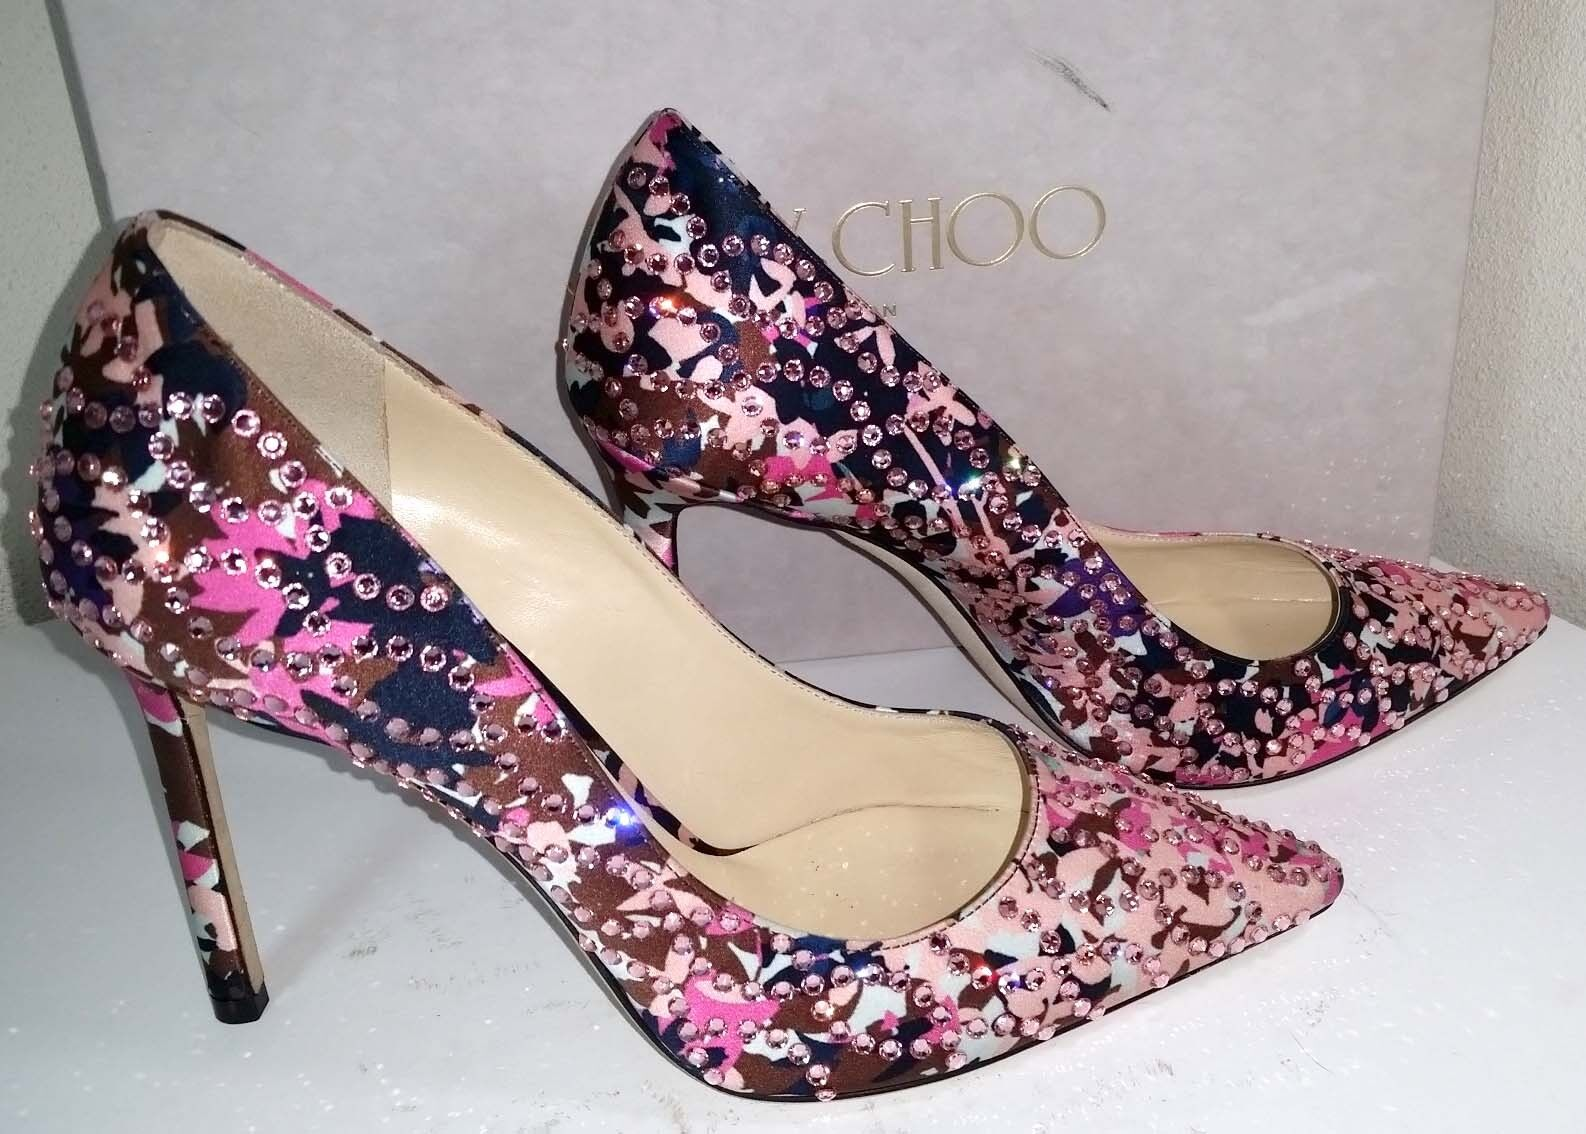 Jimmy Choo Romy Romy Romy Pointy Toe Pump Dahlia Floral Pointed-Toe 100Mm Heels schuhe 36.5 00eb9a